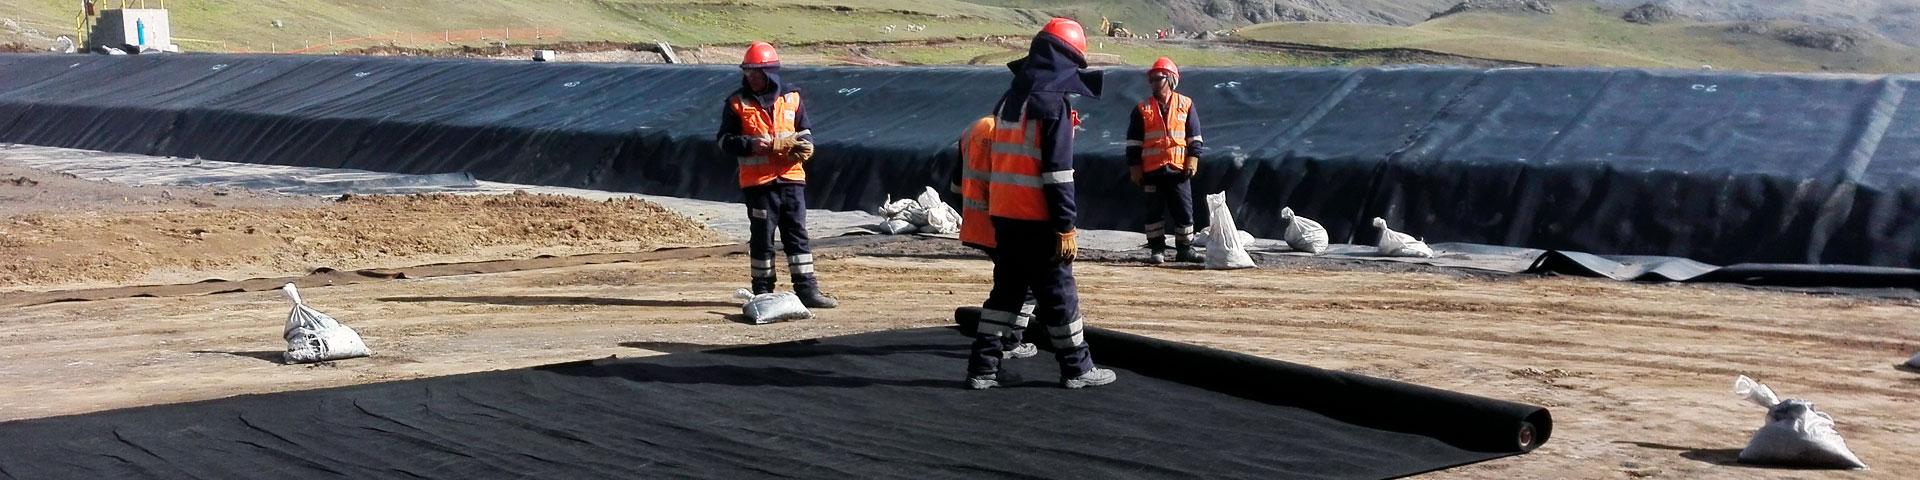 Geosinteticos, MyR Serviplast del Perù